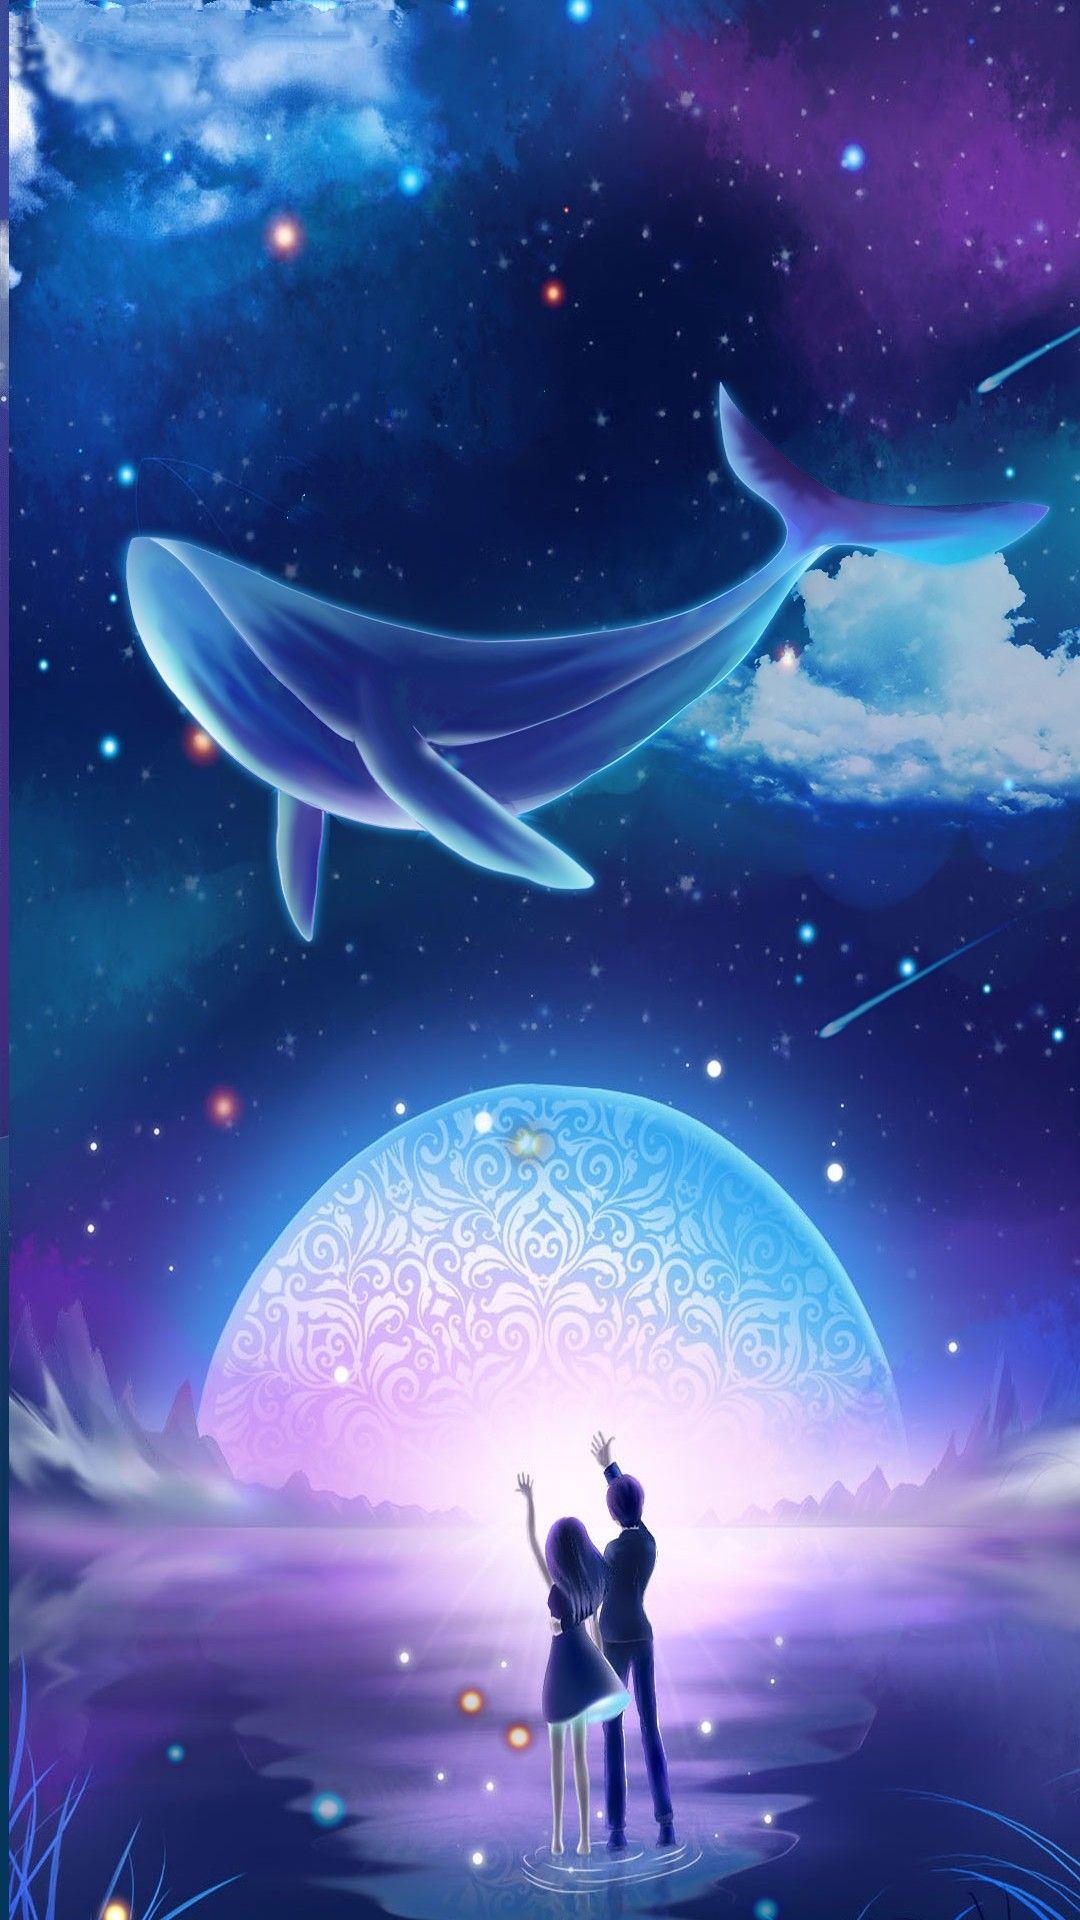 Pin By Shana Magill On Wallpaper Anime Scenery Cute Wallpapers Cute Wallpaper Backgrounds